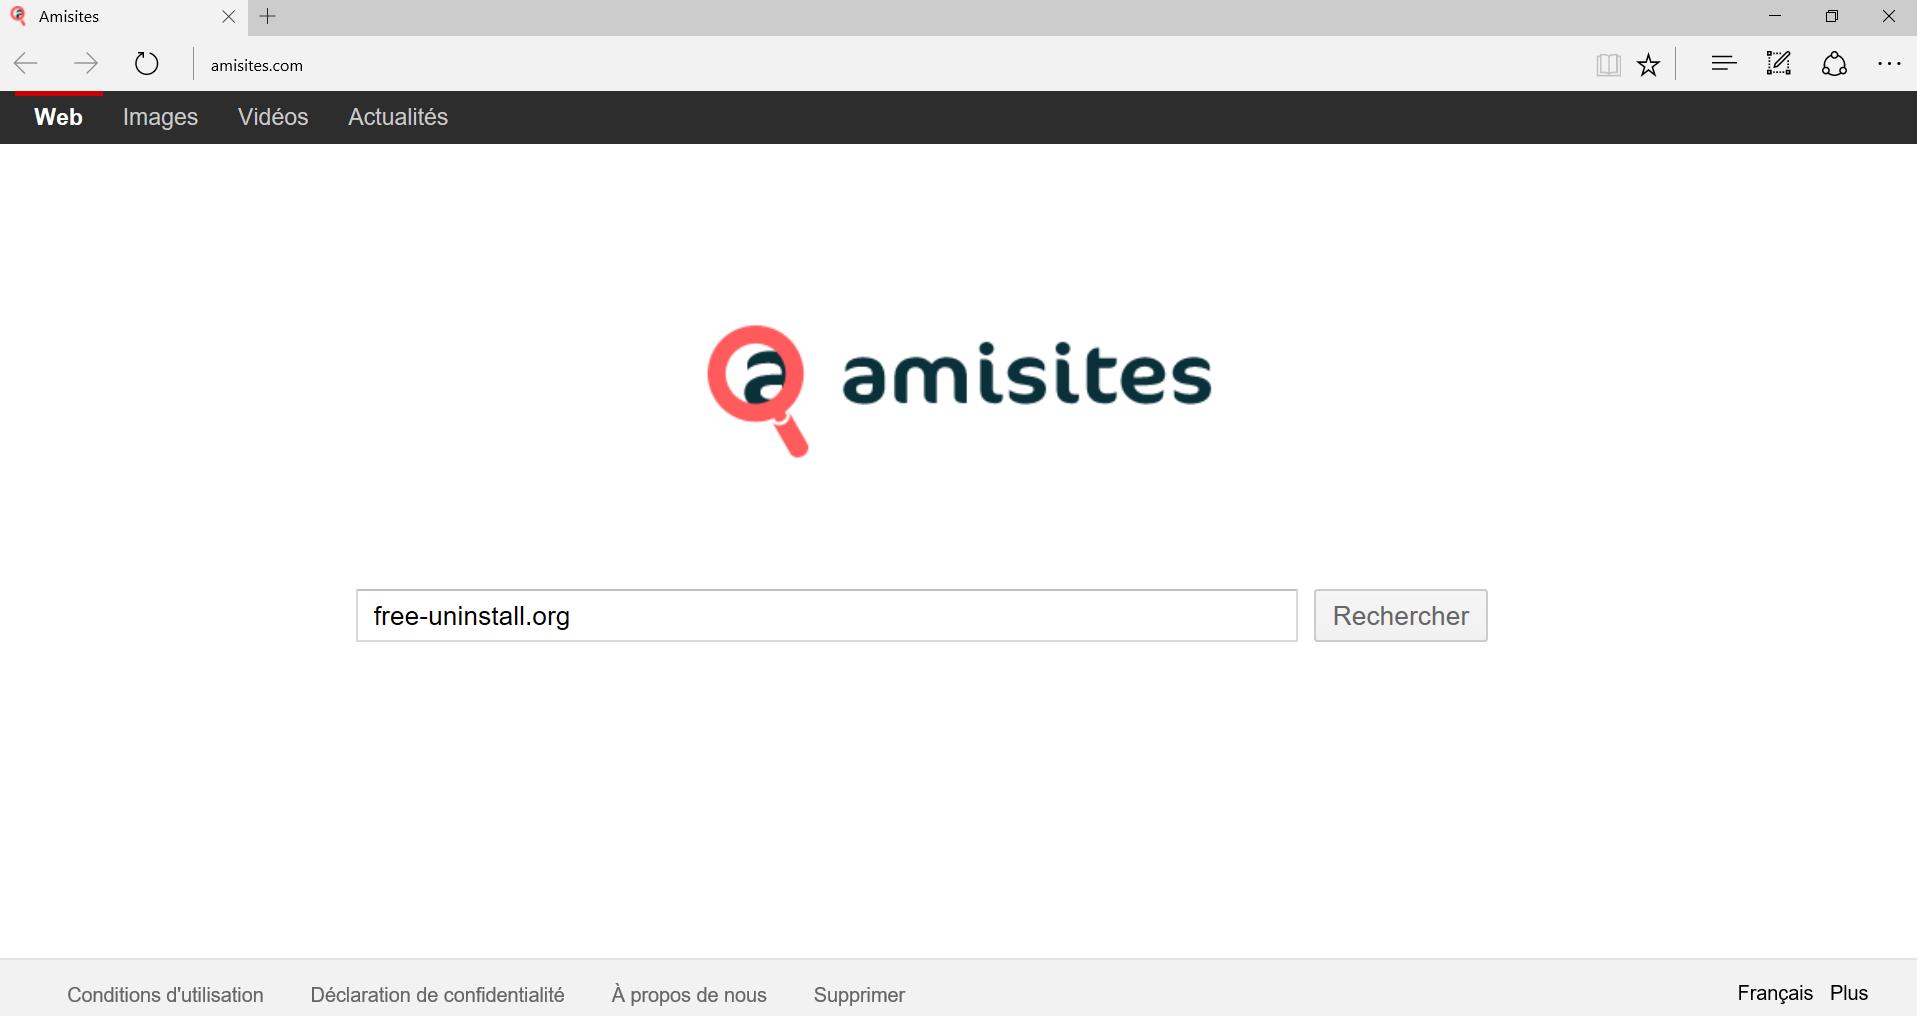 Amisites.com Hijacker